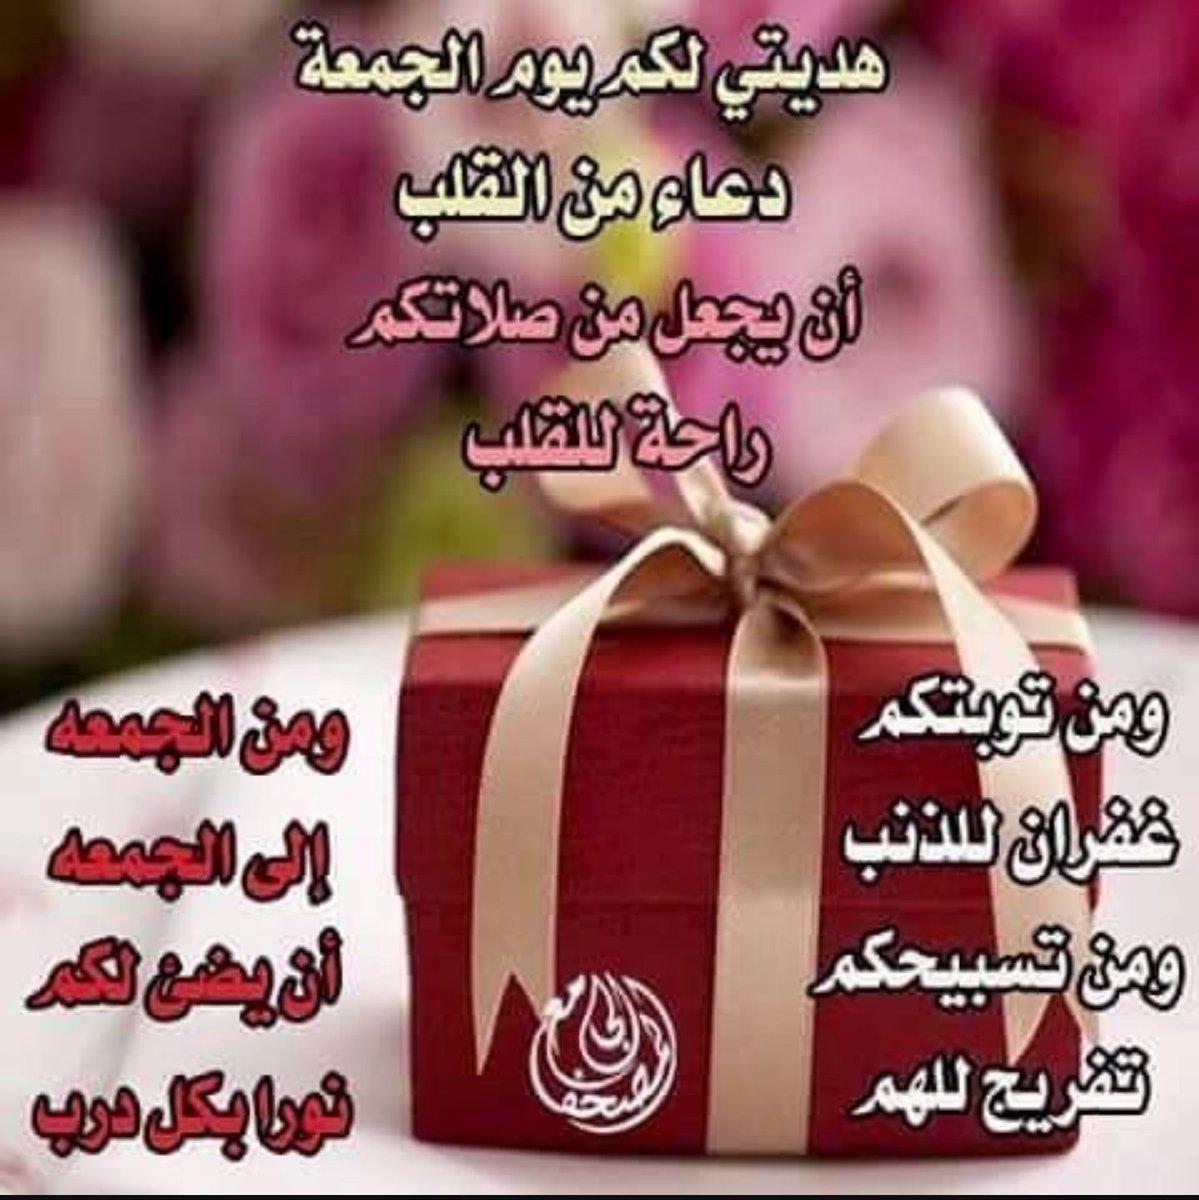 جزائرية وأفتخر's photo on #جمعه_مباركه